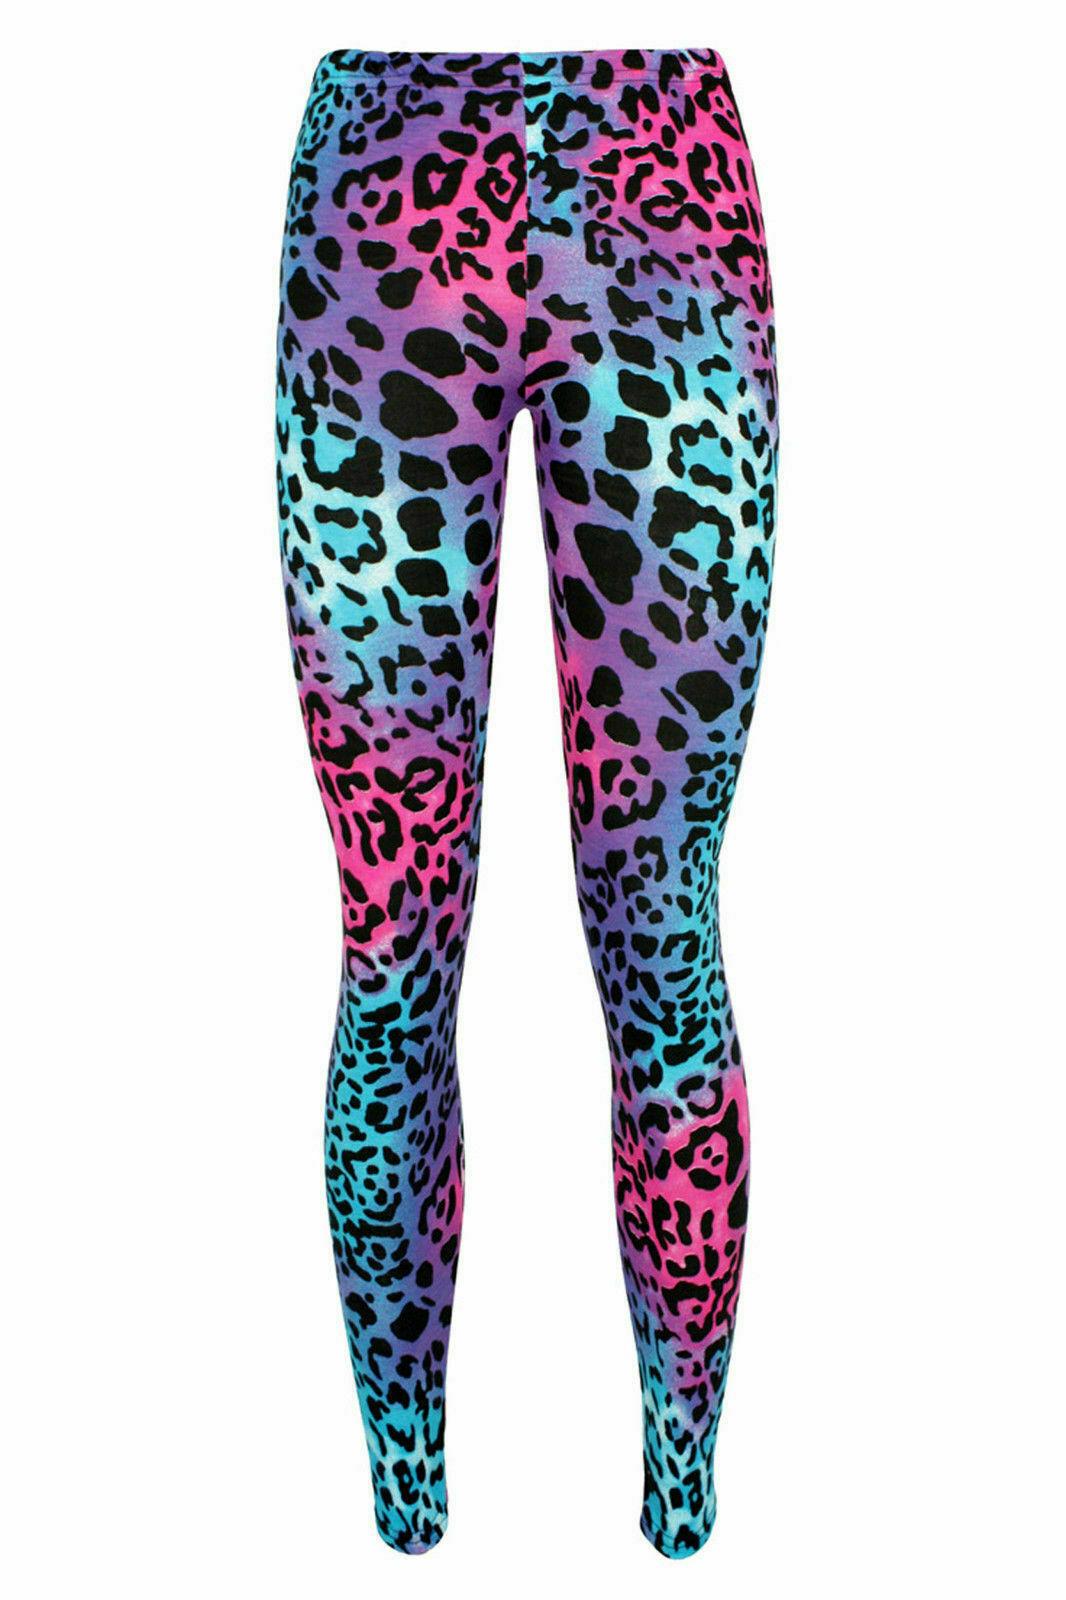 Crazy Chick Girls Microfiber Leopard Print Pink /Blue Leggings